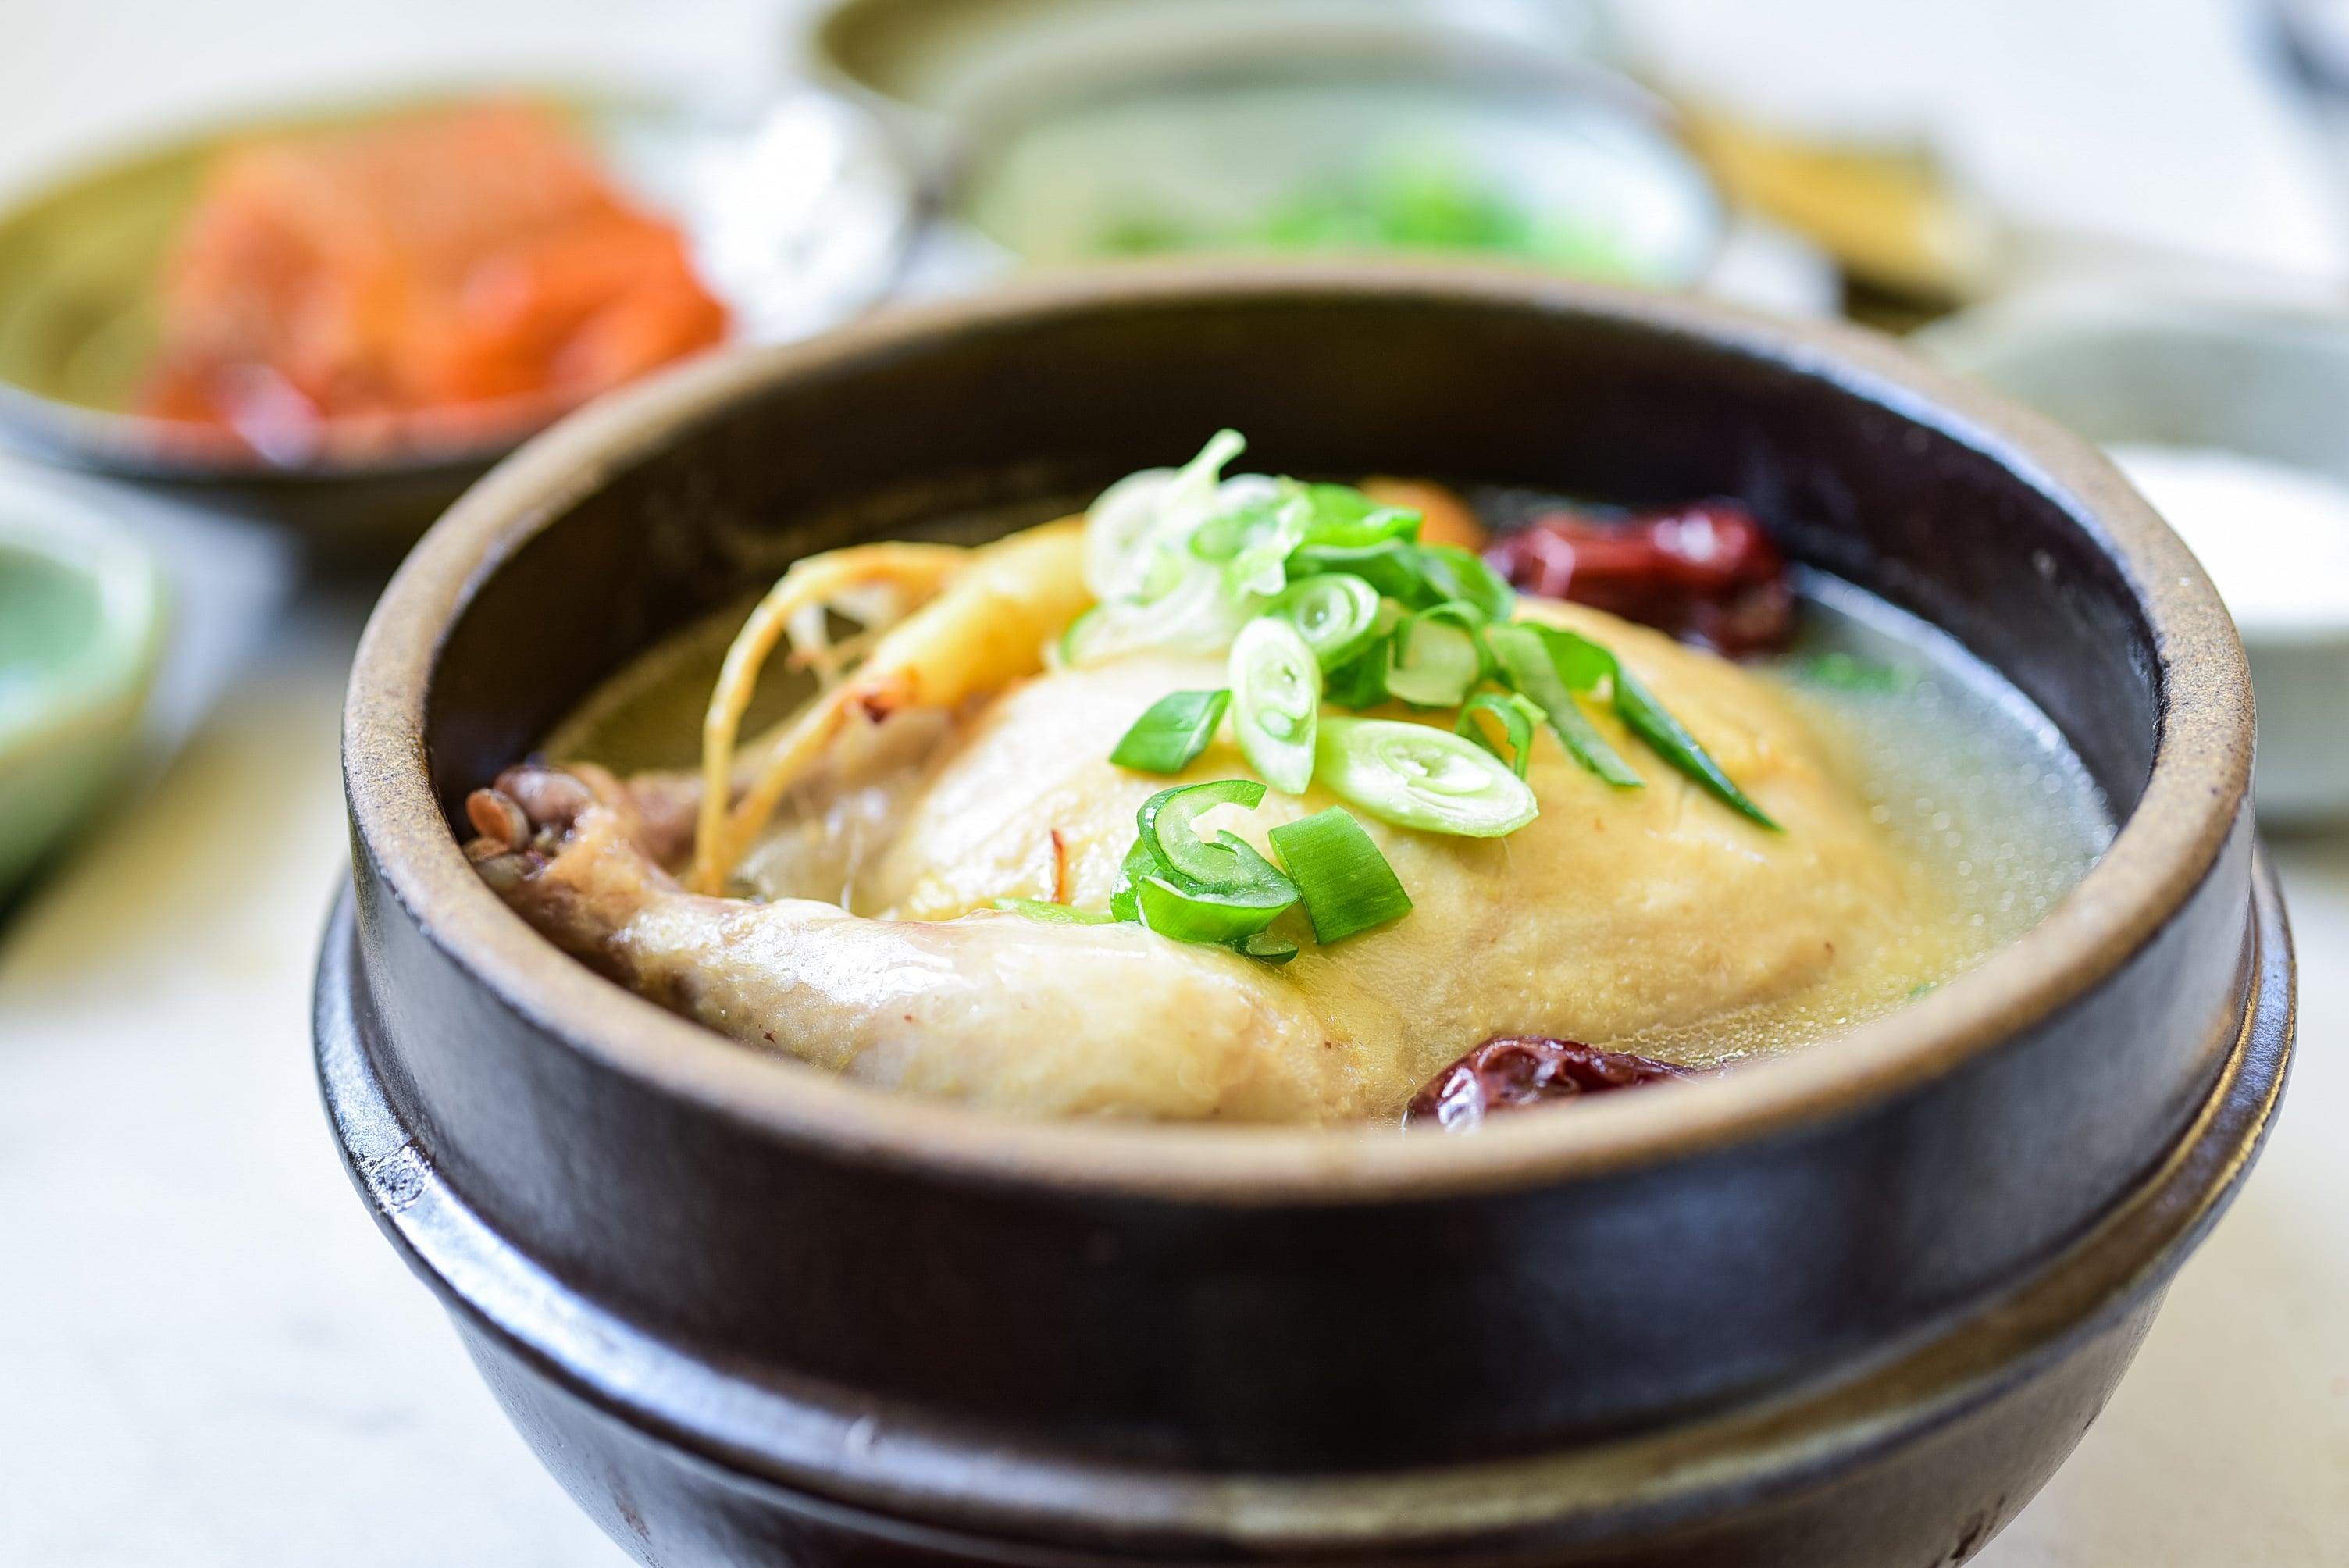 DSC 5116 - Samgyetang (Ginseng Chicken Soup)